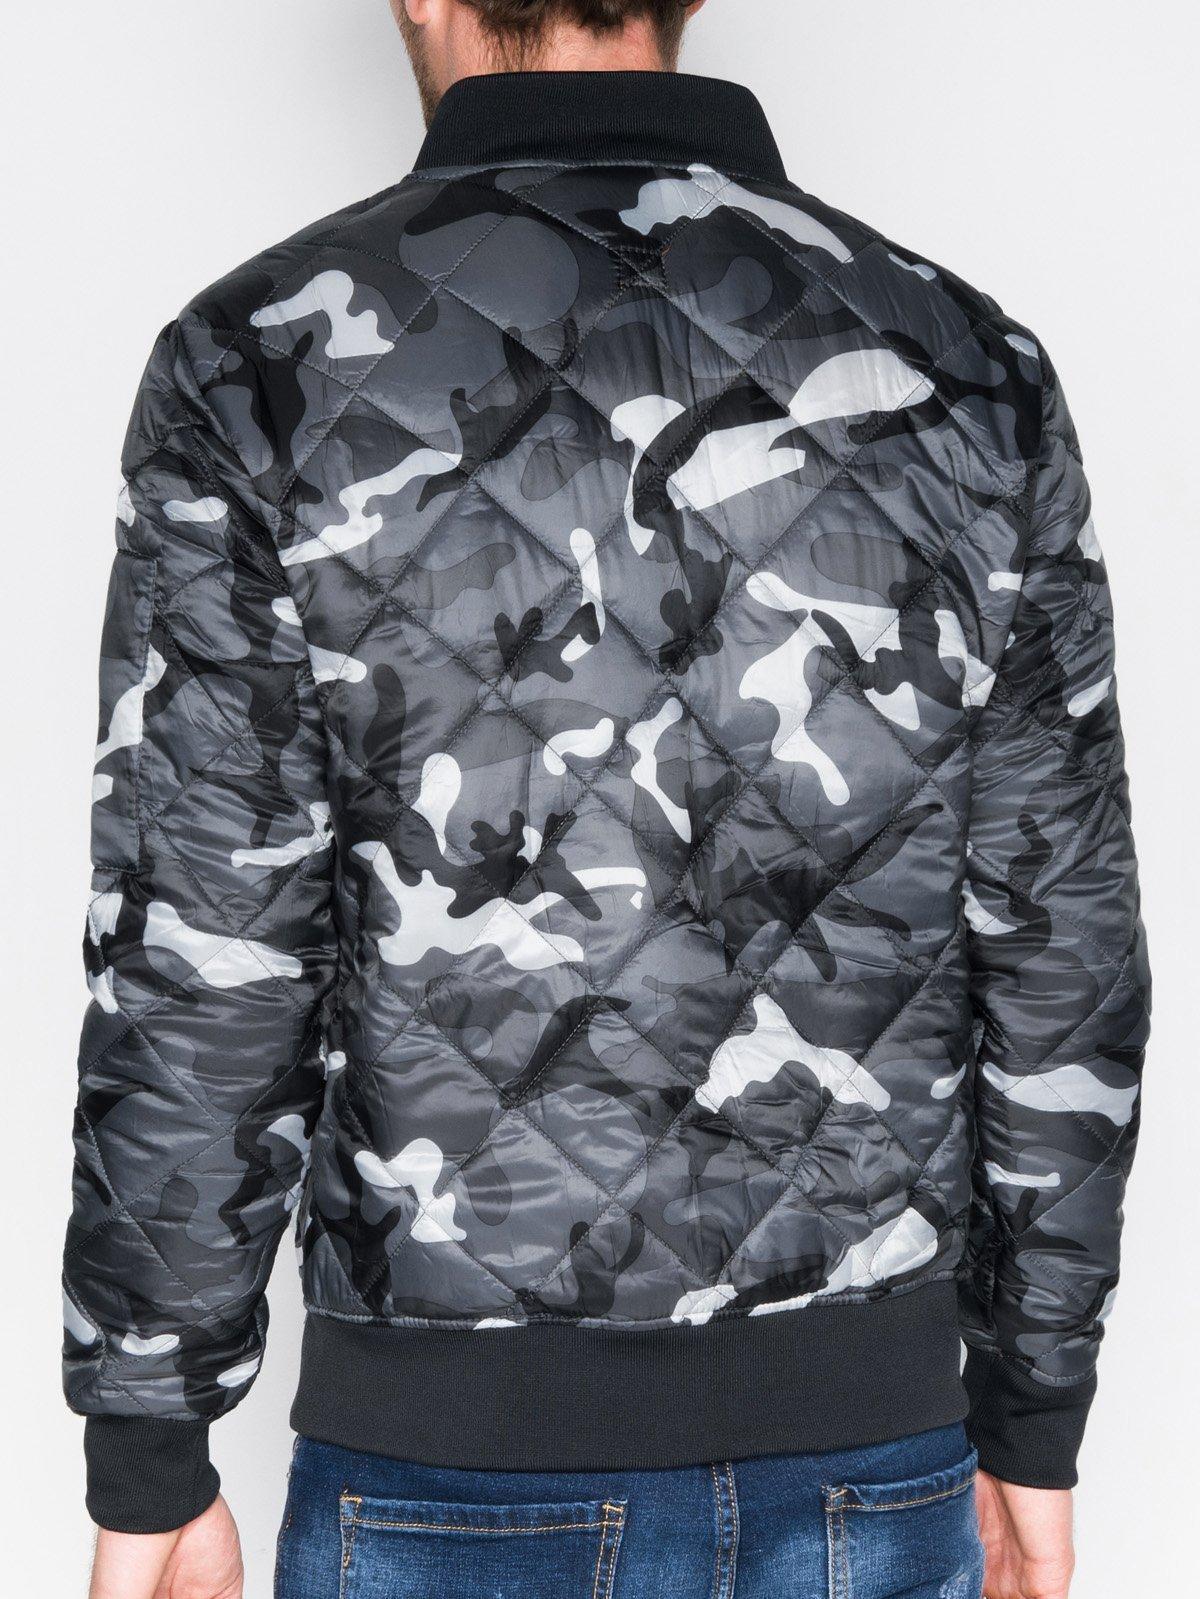 Brillant Warnschutz Polohemd Klasse 2 Größe Xl 109-116cm Polo Hemd Neu Neu Top Arbeitskleidung & -schutz